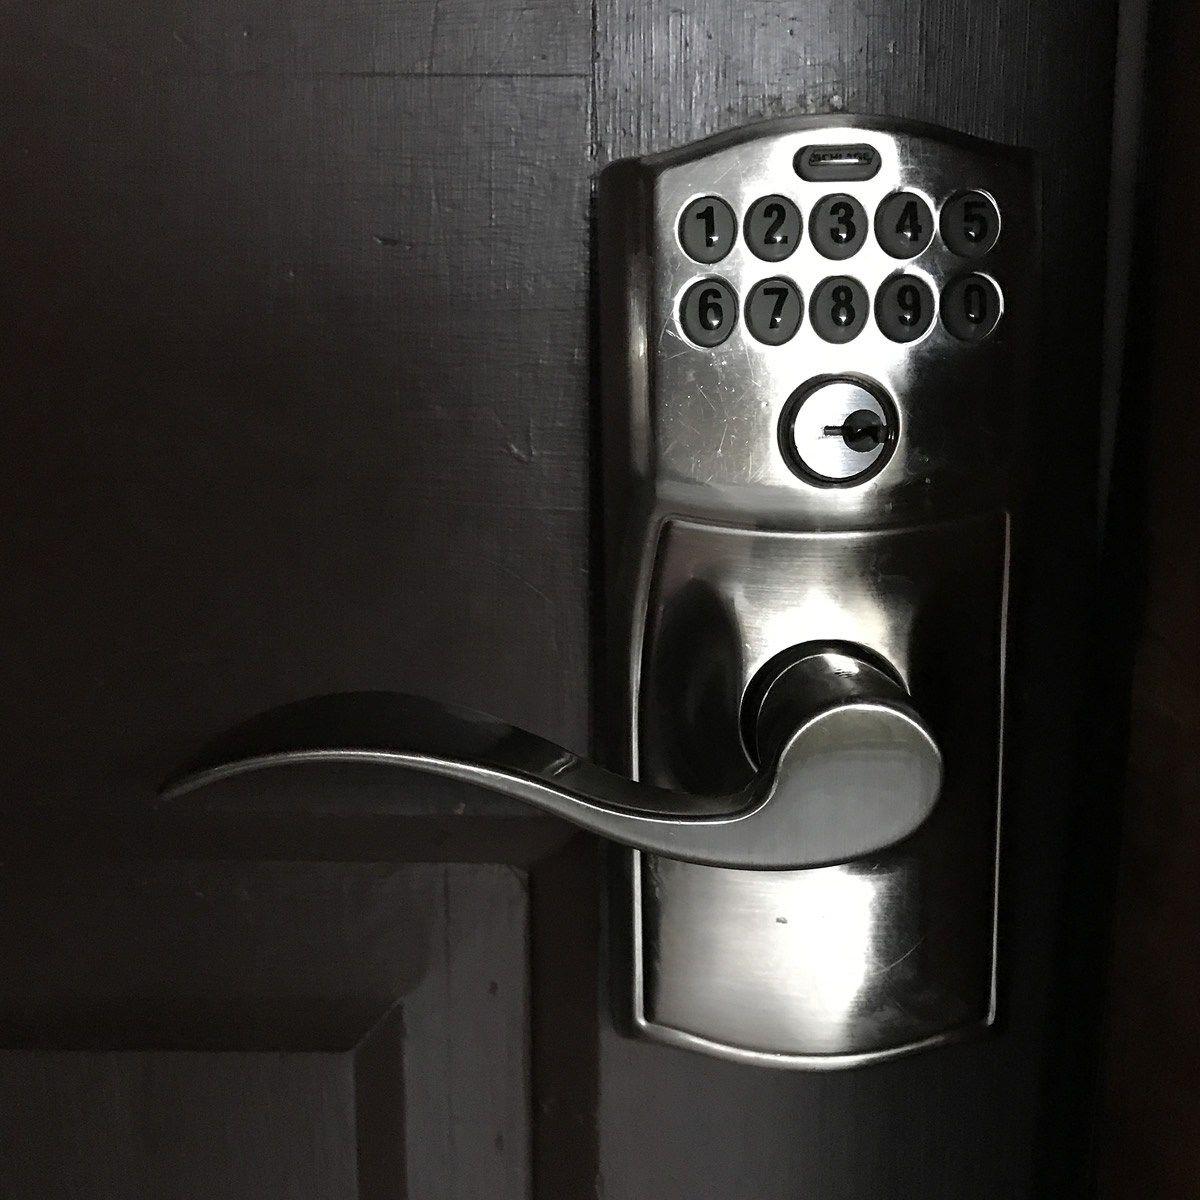 Schlage Z Wave Keypad Lever Lock Project Keyless Door Locks Nexia Home System Keypad Locks Unlock The Door With Keyless Door Lock Door Locks Keypad Lock